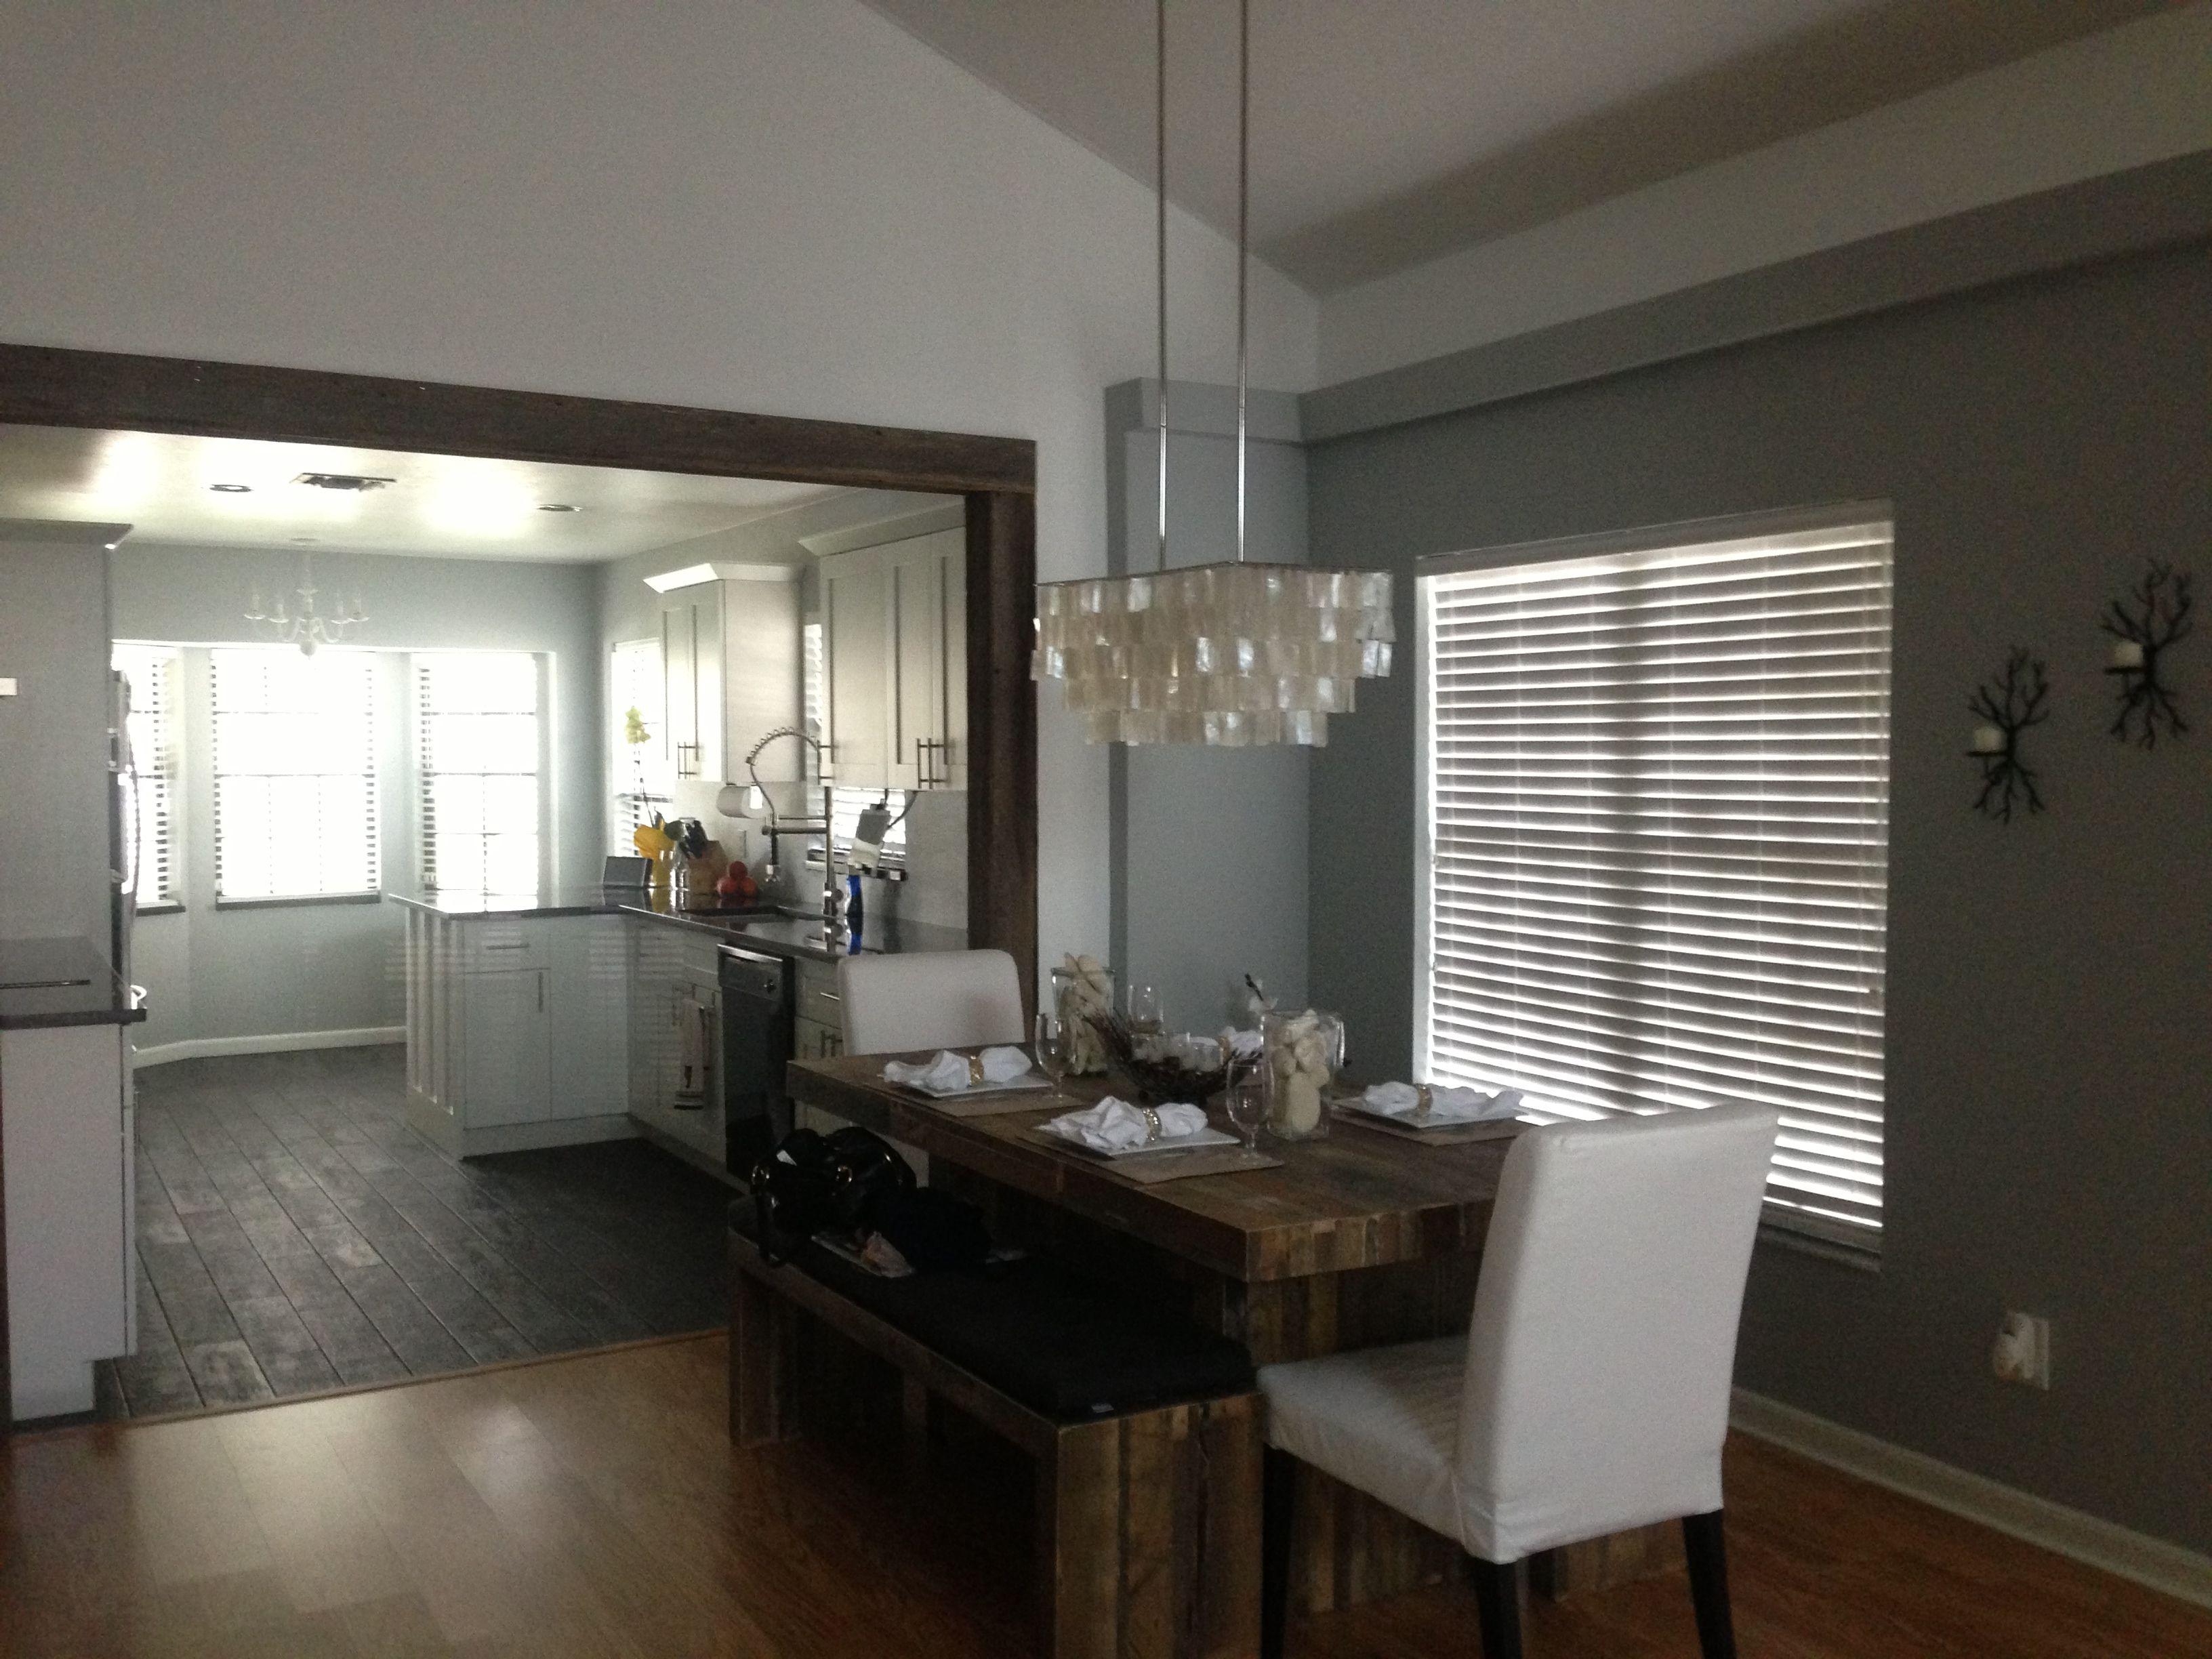 Our DIY home renovation | Home renovation, Home, Home ...